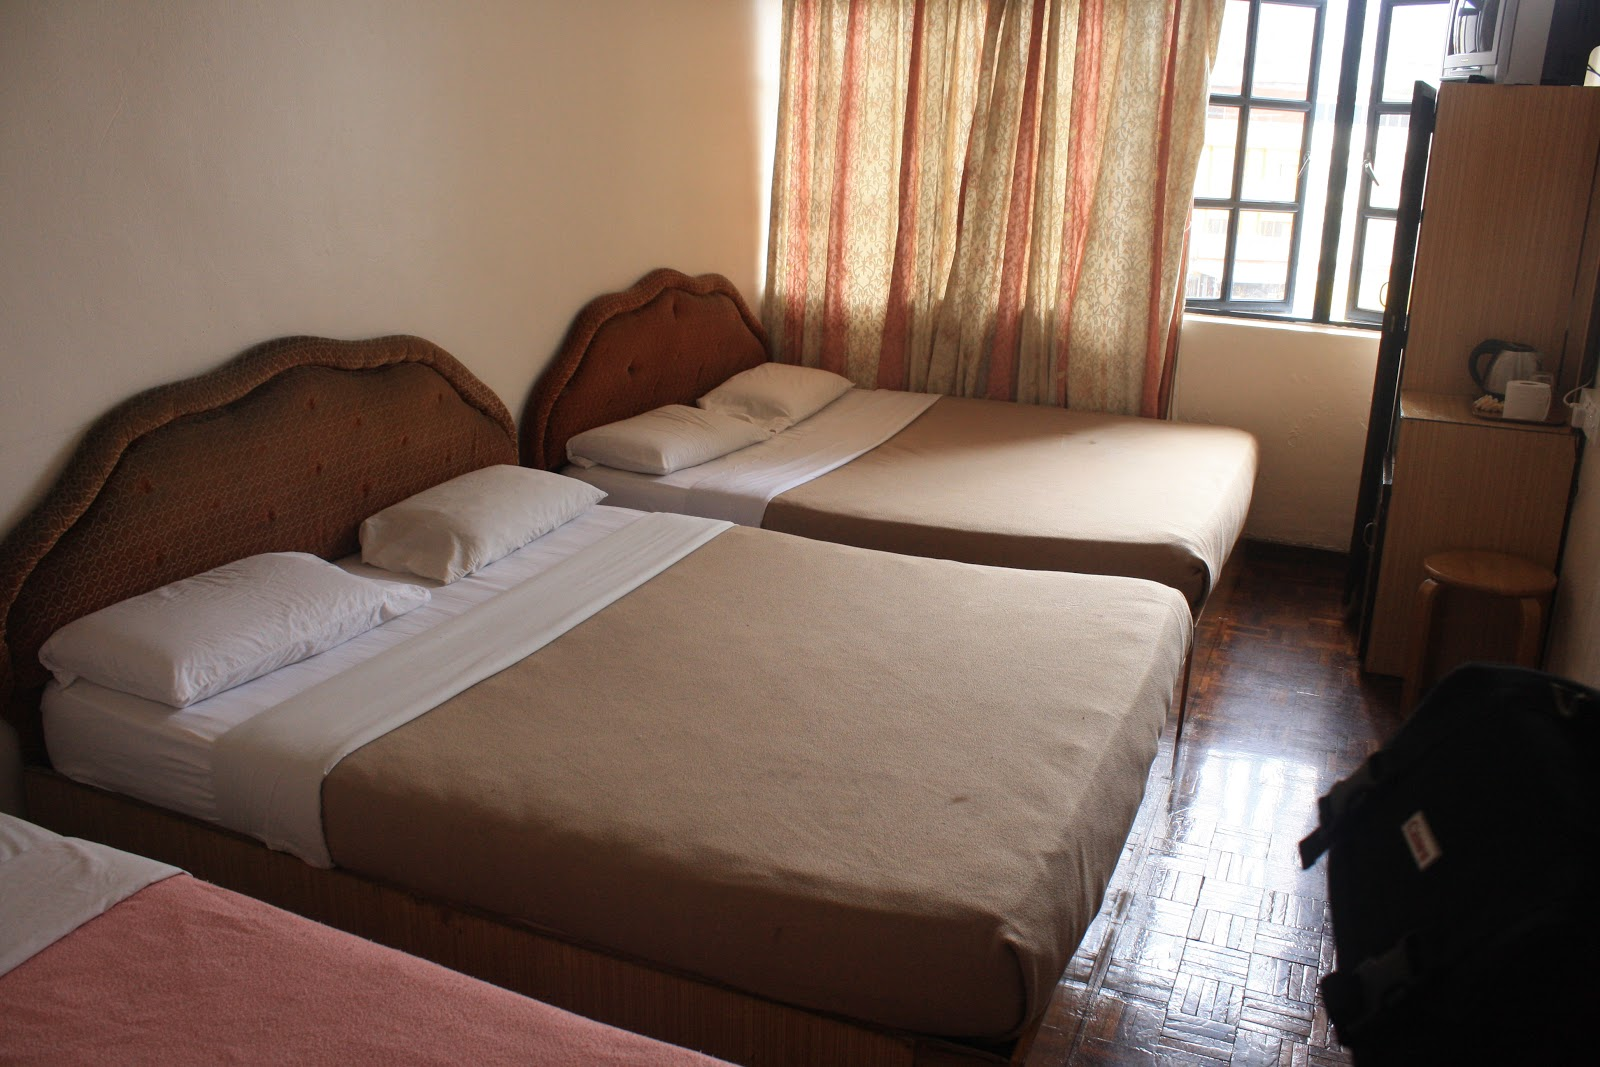 Satu Hotel Chua Gin Ni Rainbow Malam Dekat RM160 Ada Dua Queen Bed Manakala Rupa Dia Macam